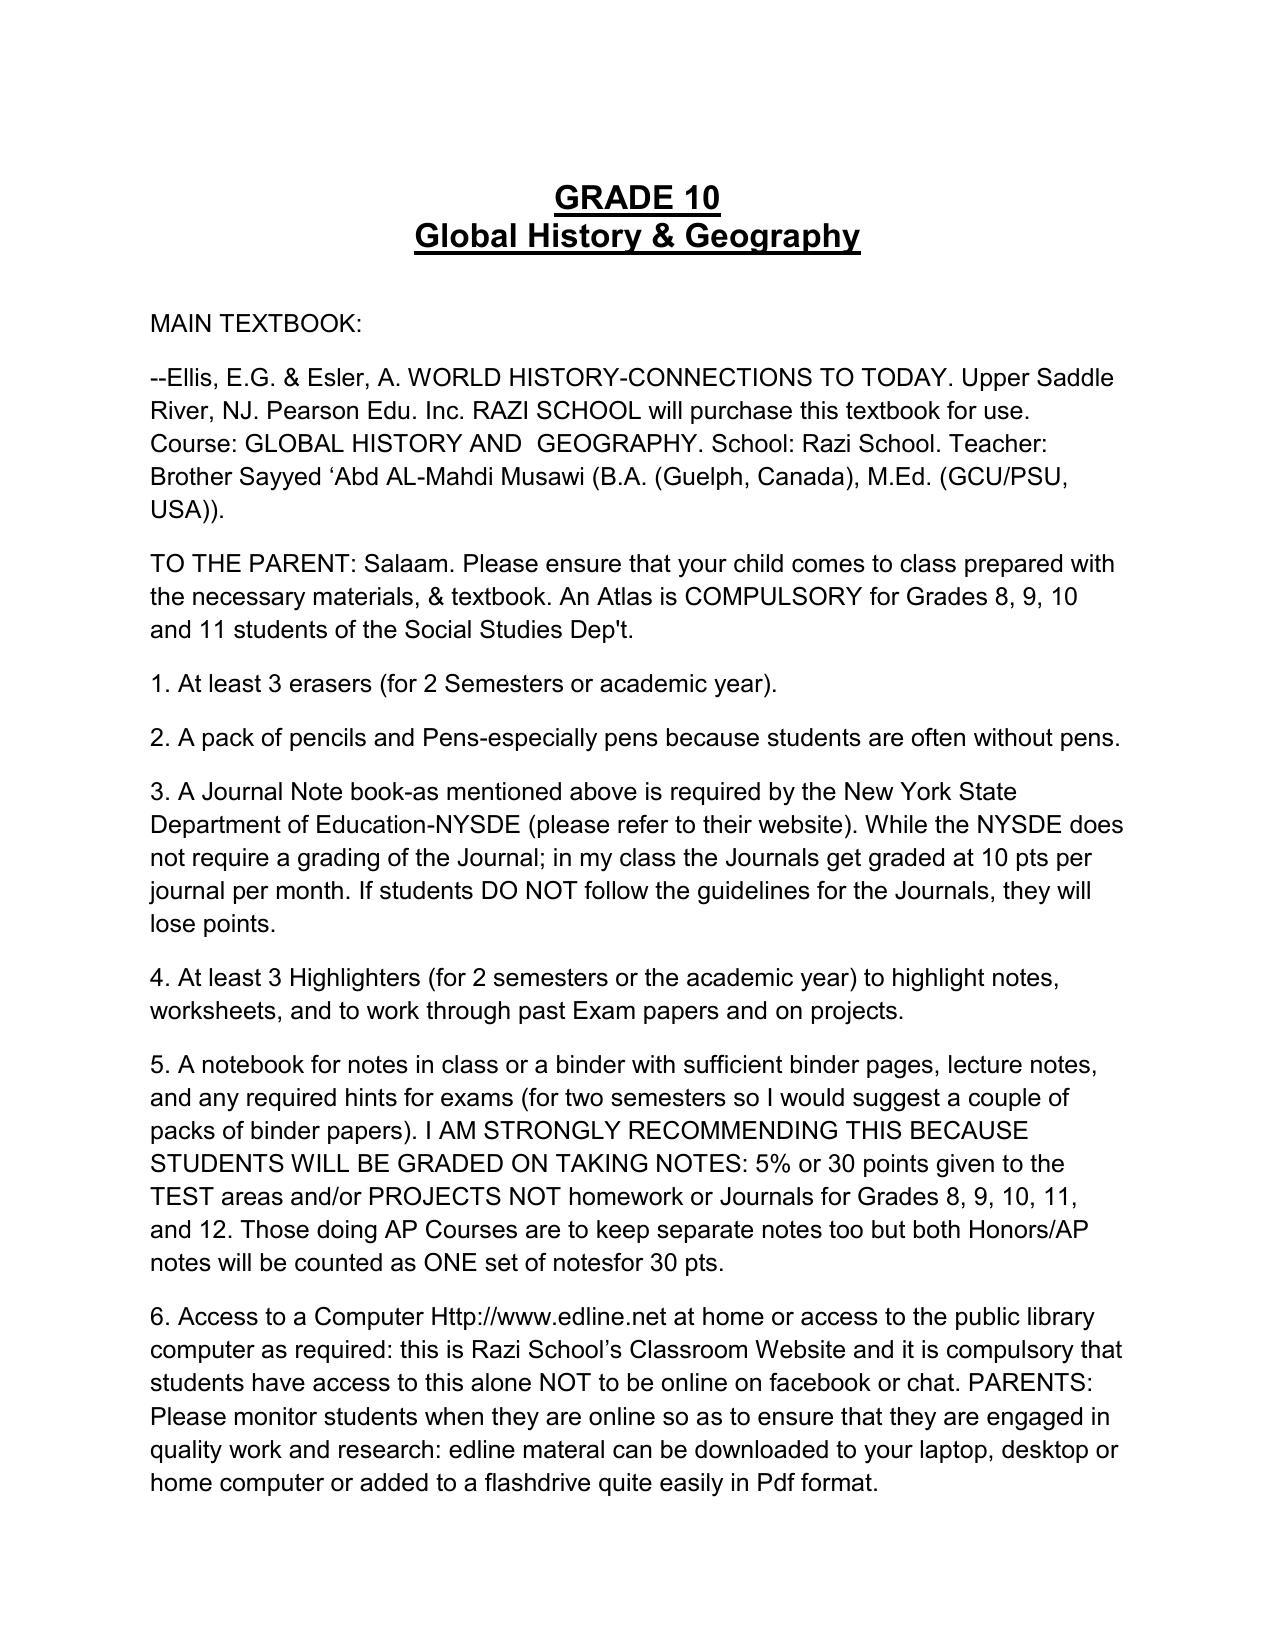 hight resolution of Grade 10 Global History \u0026 Geography